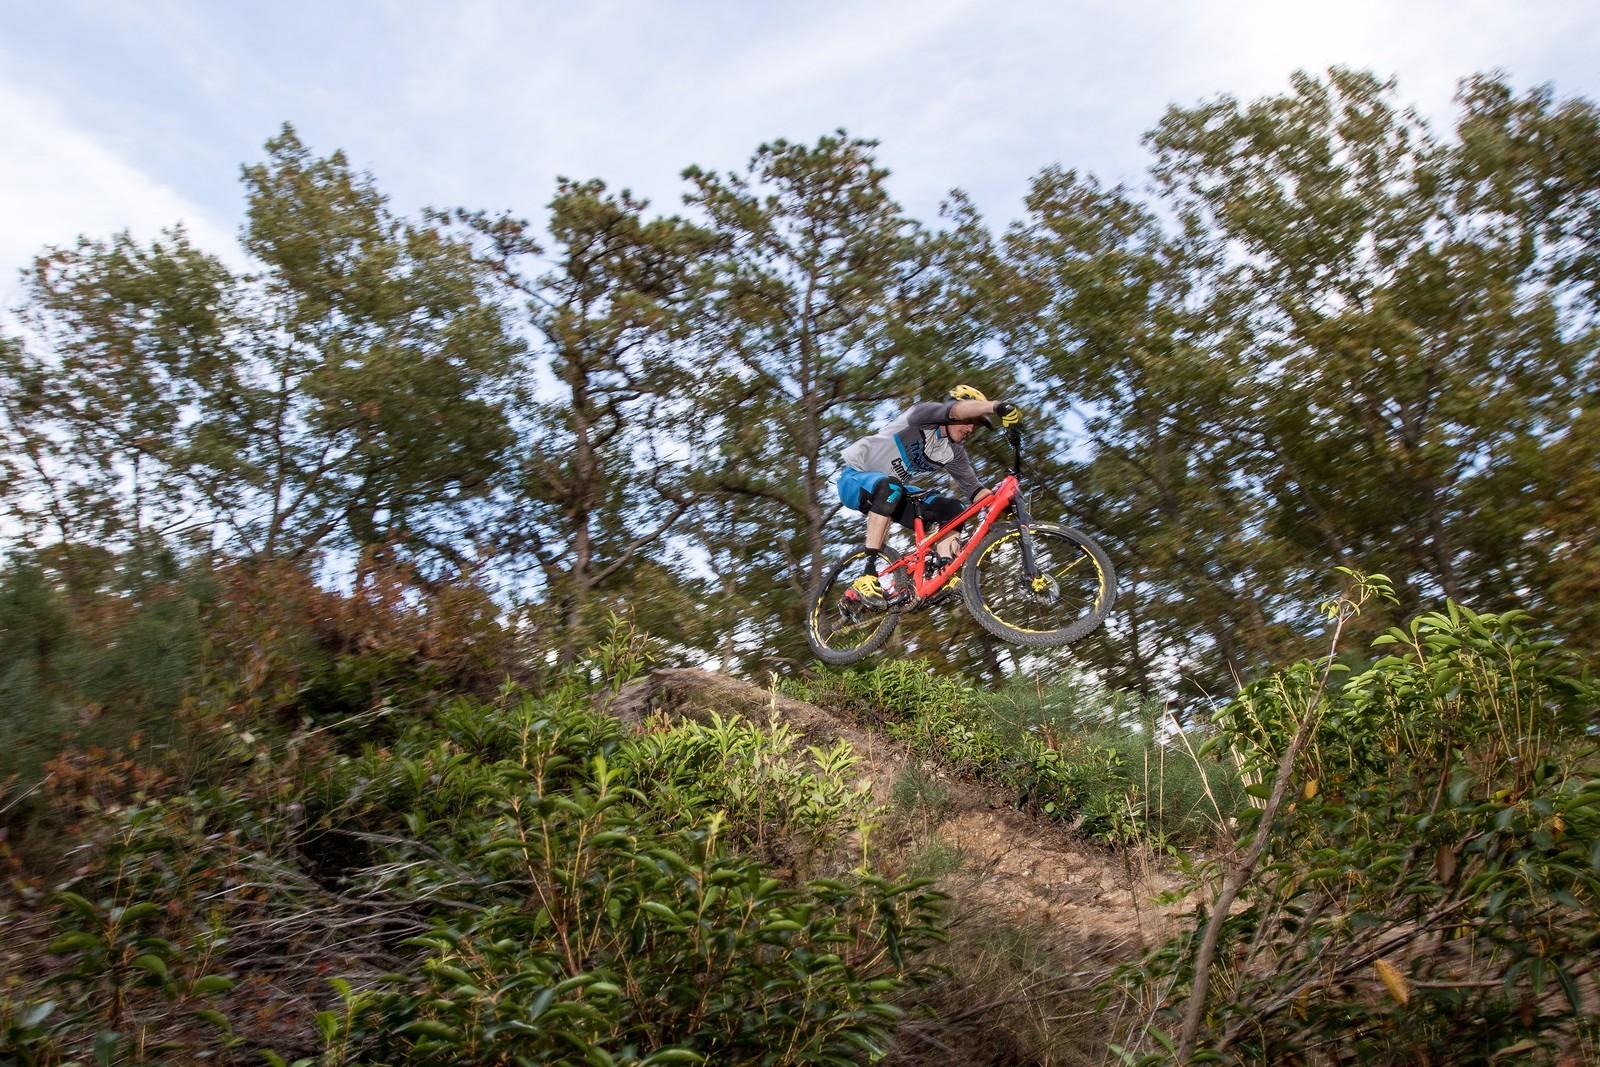 Scouting a drop - gerrycreighton - Mountain Biking Pictures - Vital MTB